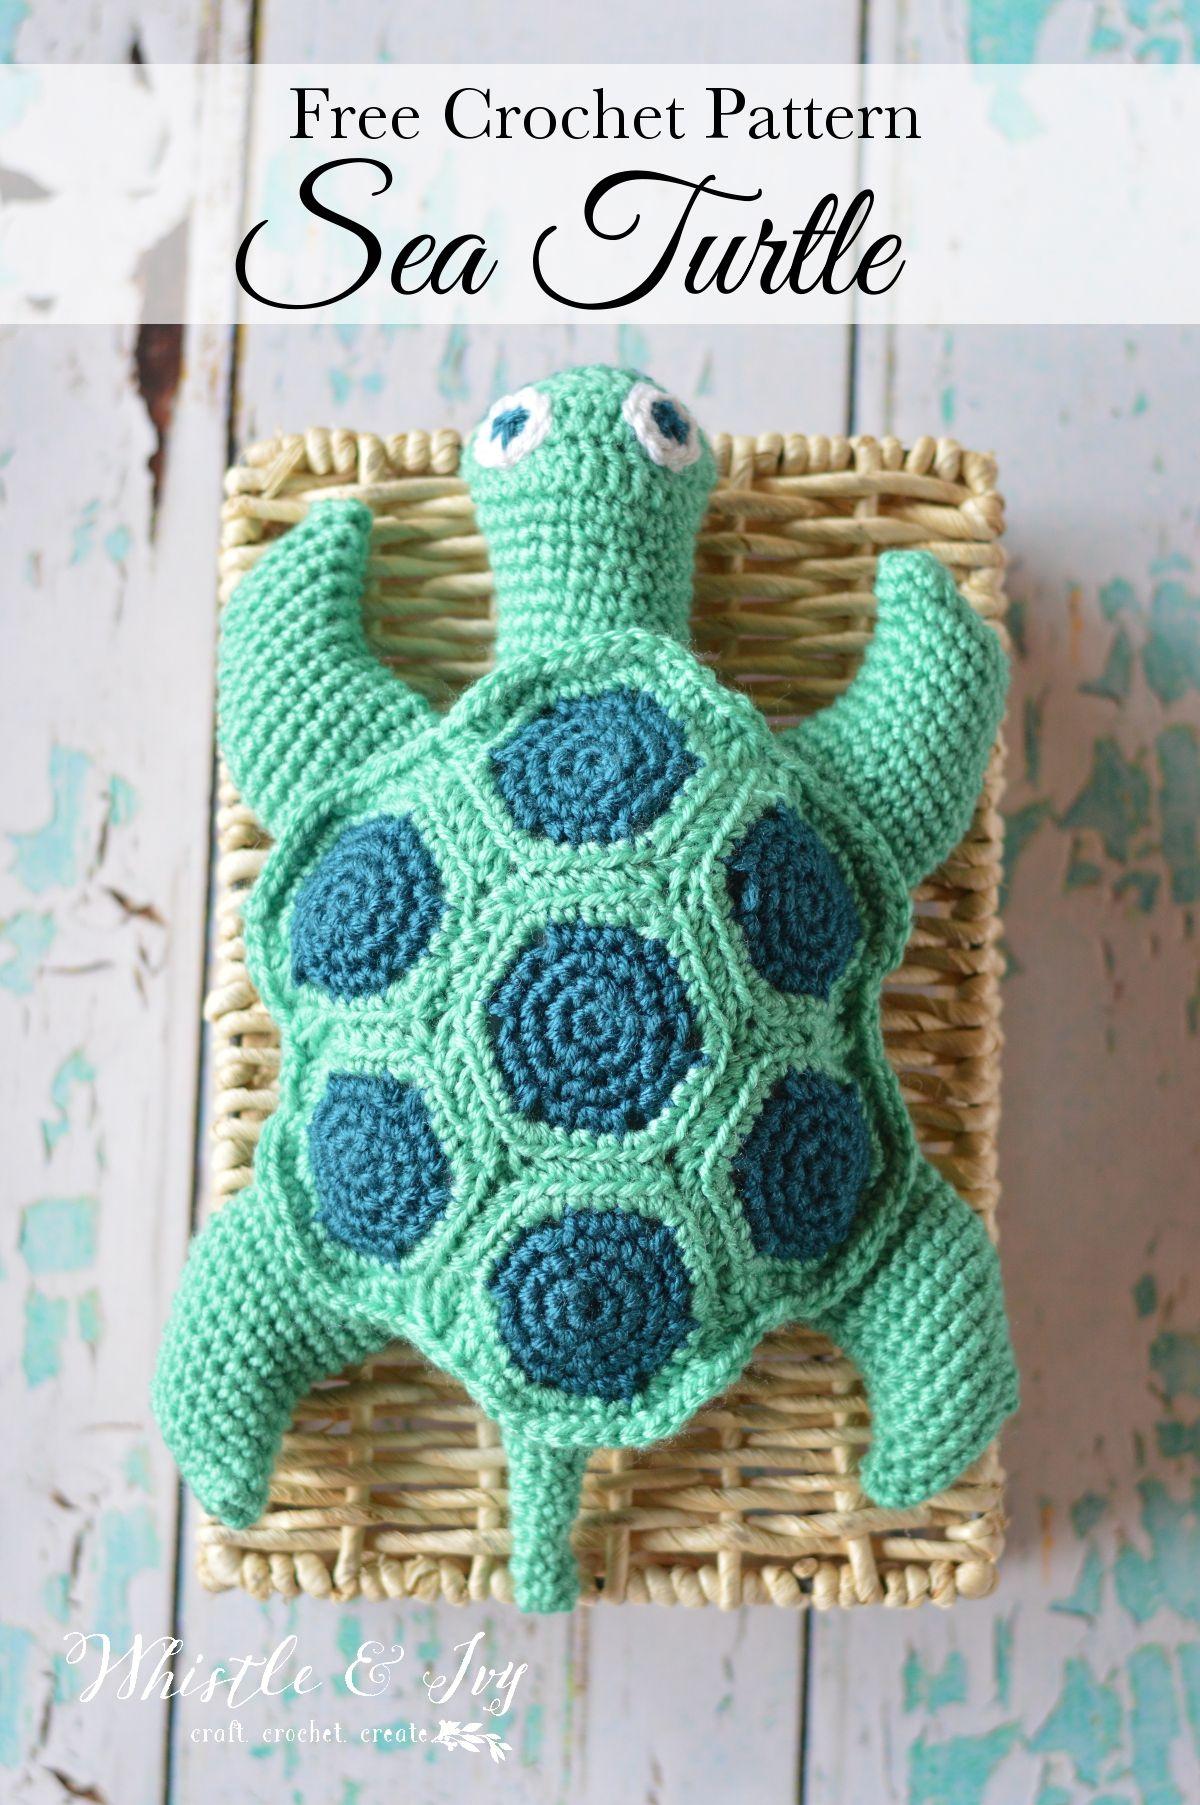 Crochet Sea Turtle | Häkeltiere, Tiere häkeln und Gehäkelte tiere